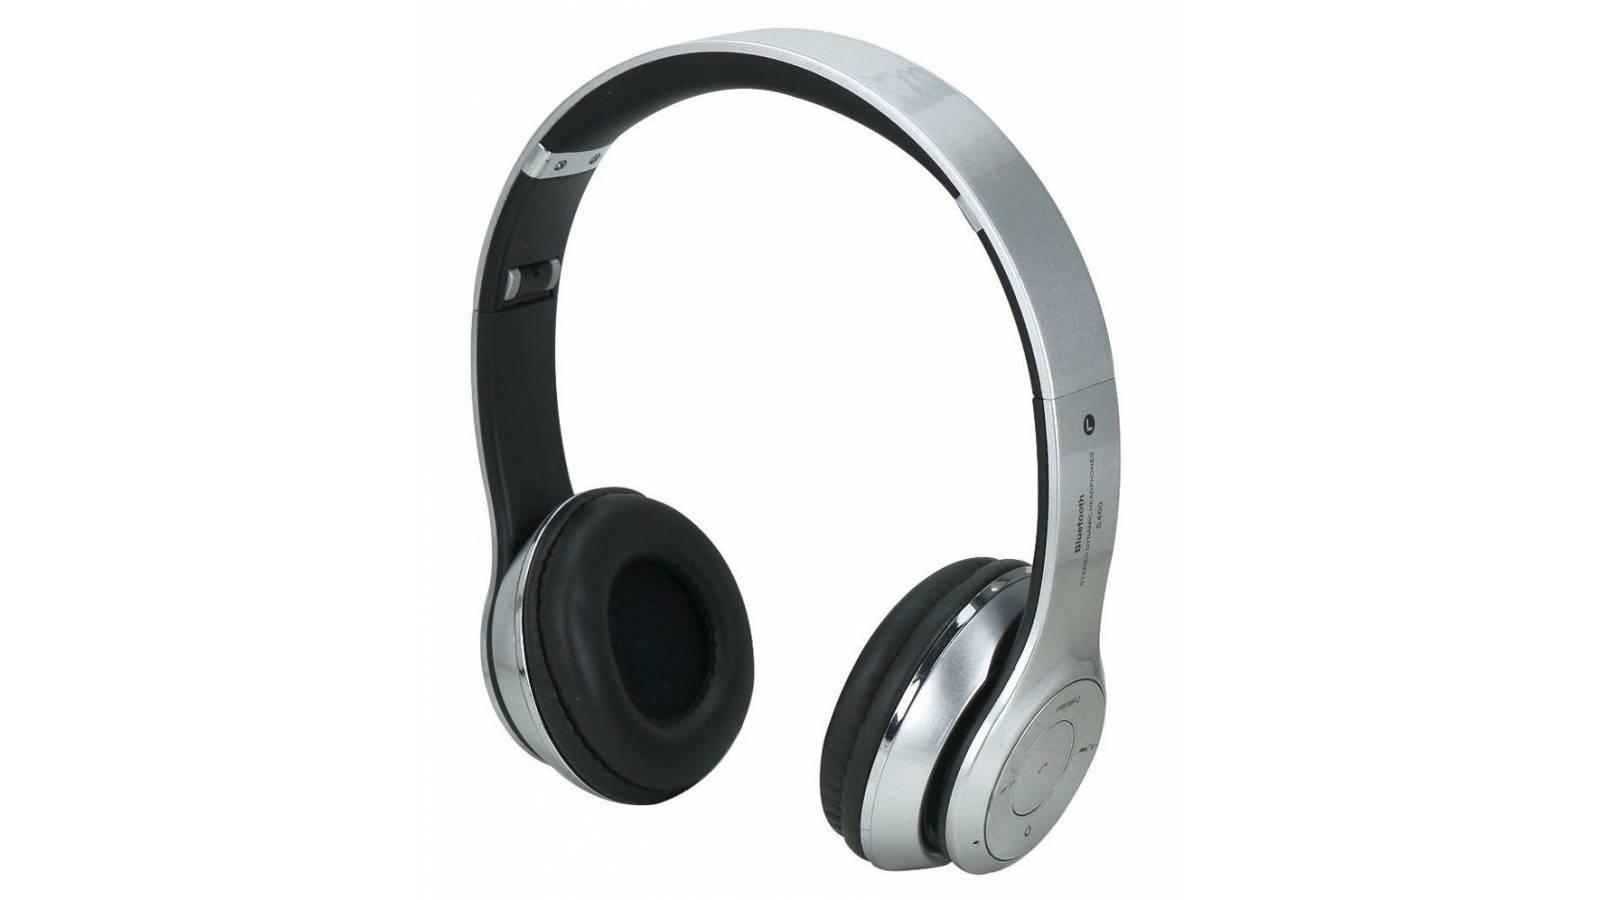 Auriculares / Auricular Inalambrico GS-460 a Bateria Bluetooth microSD FM